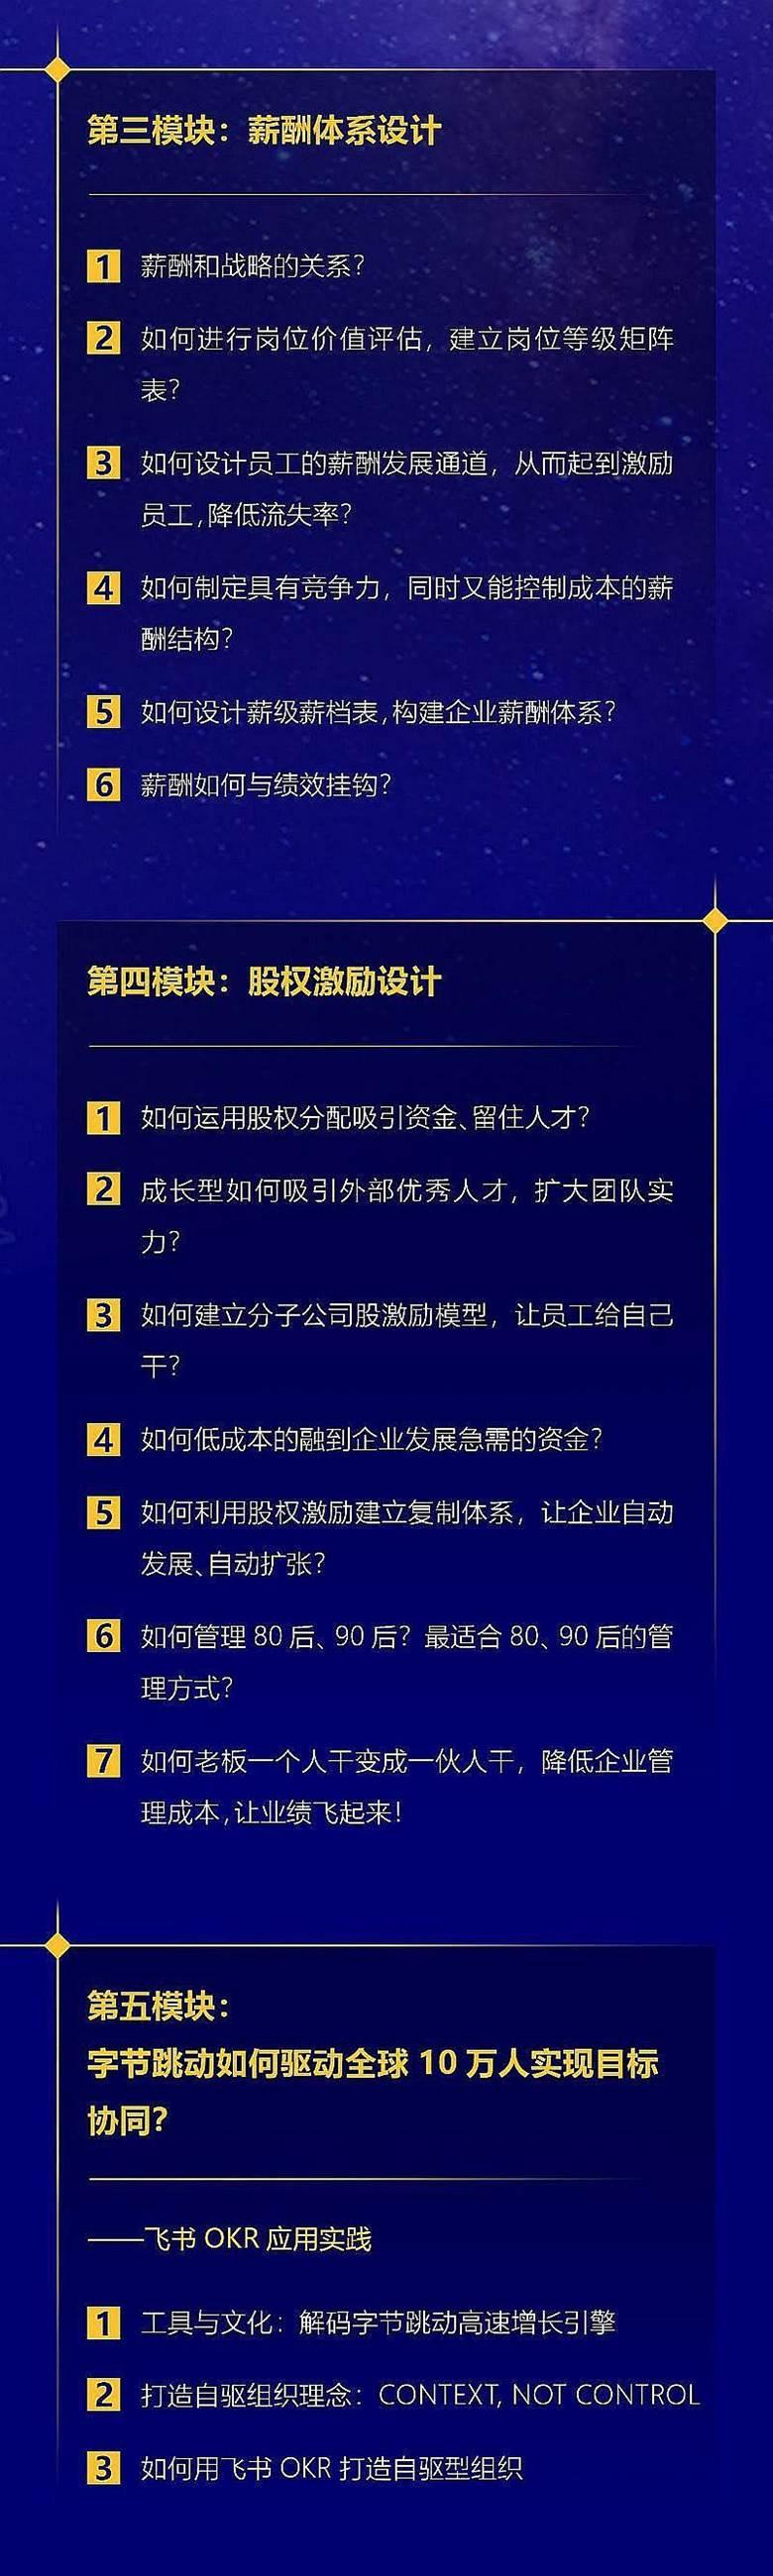 http://www.huodongxing.com/file/20191106/3803596076678/183981001066101.jpeg